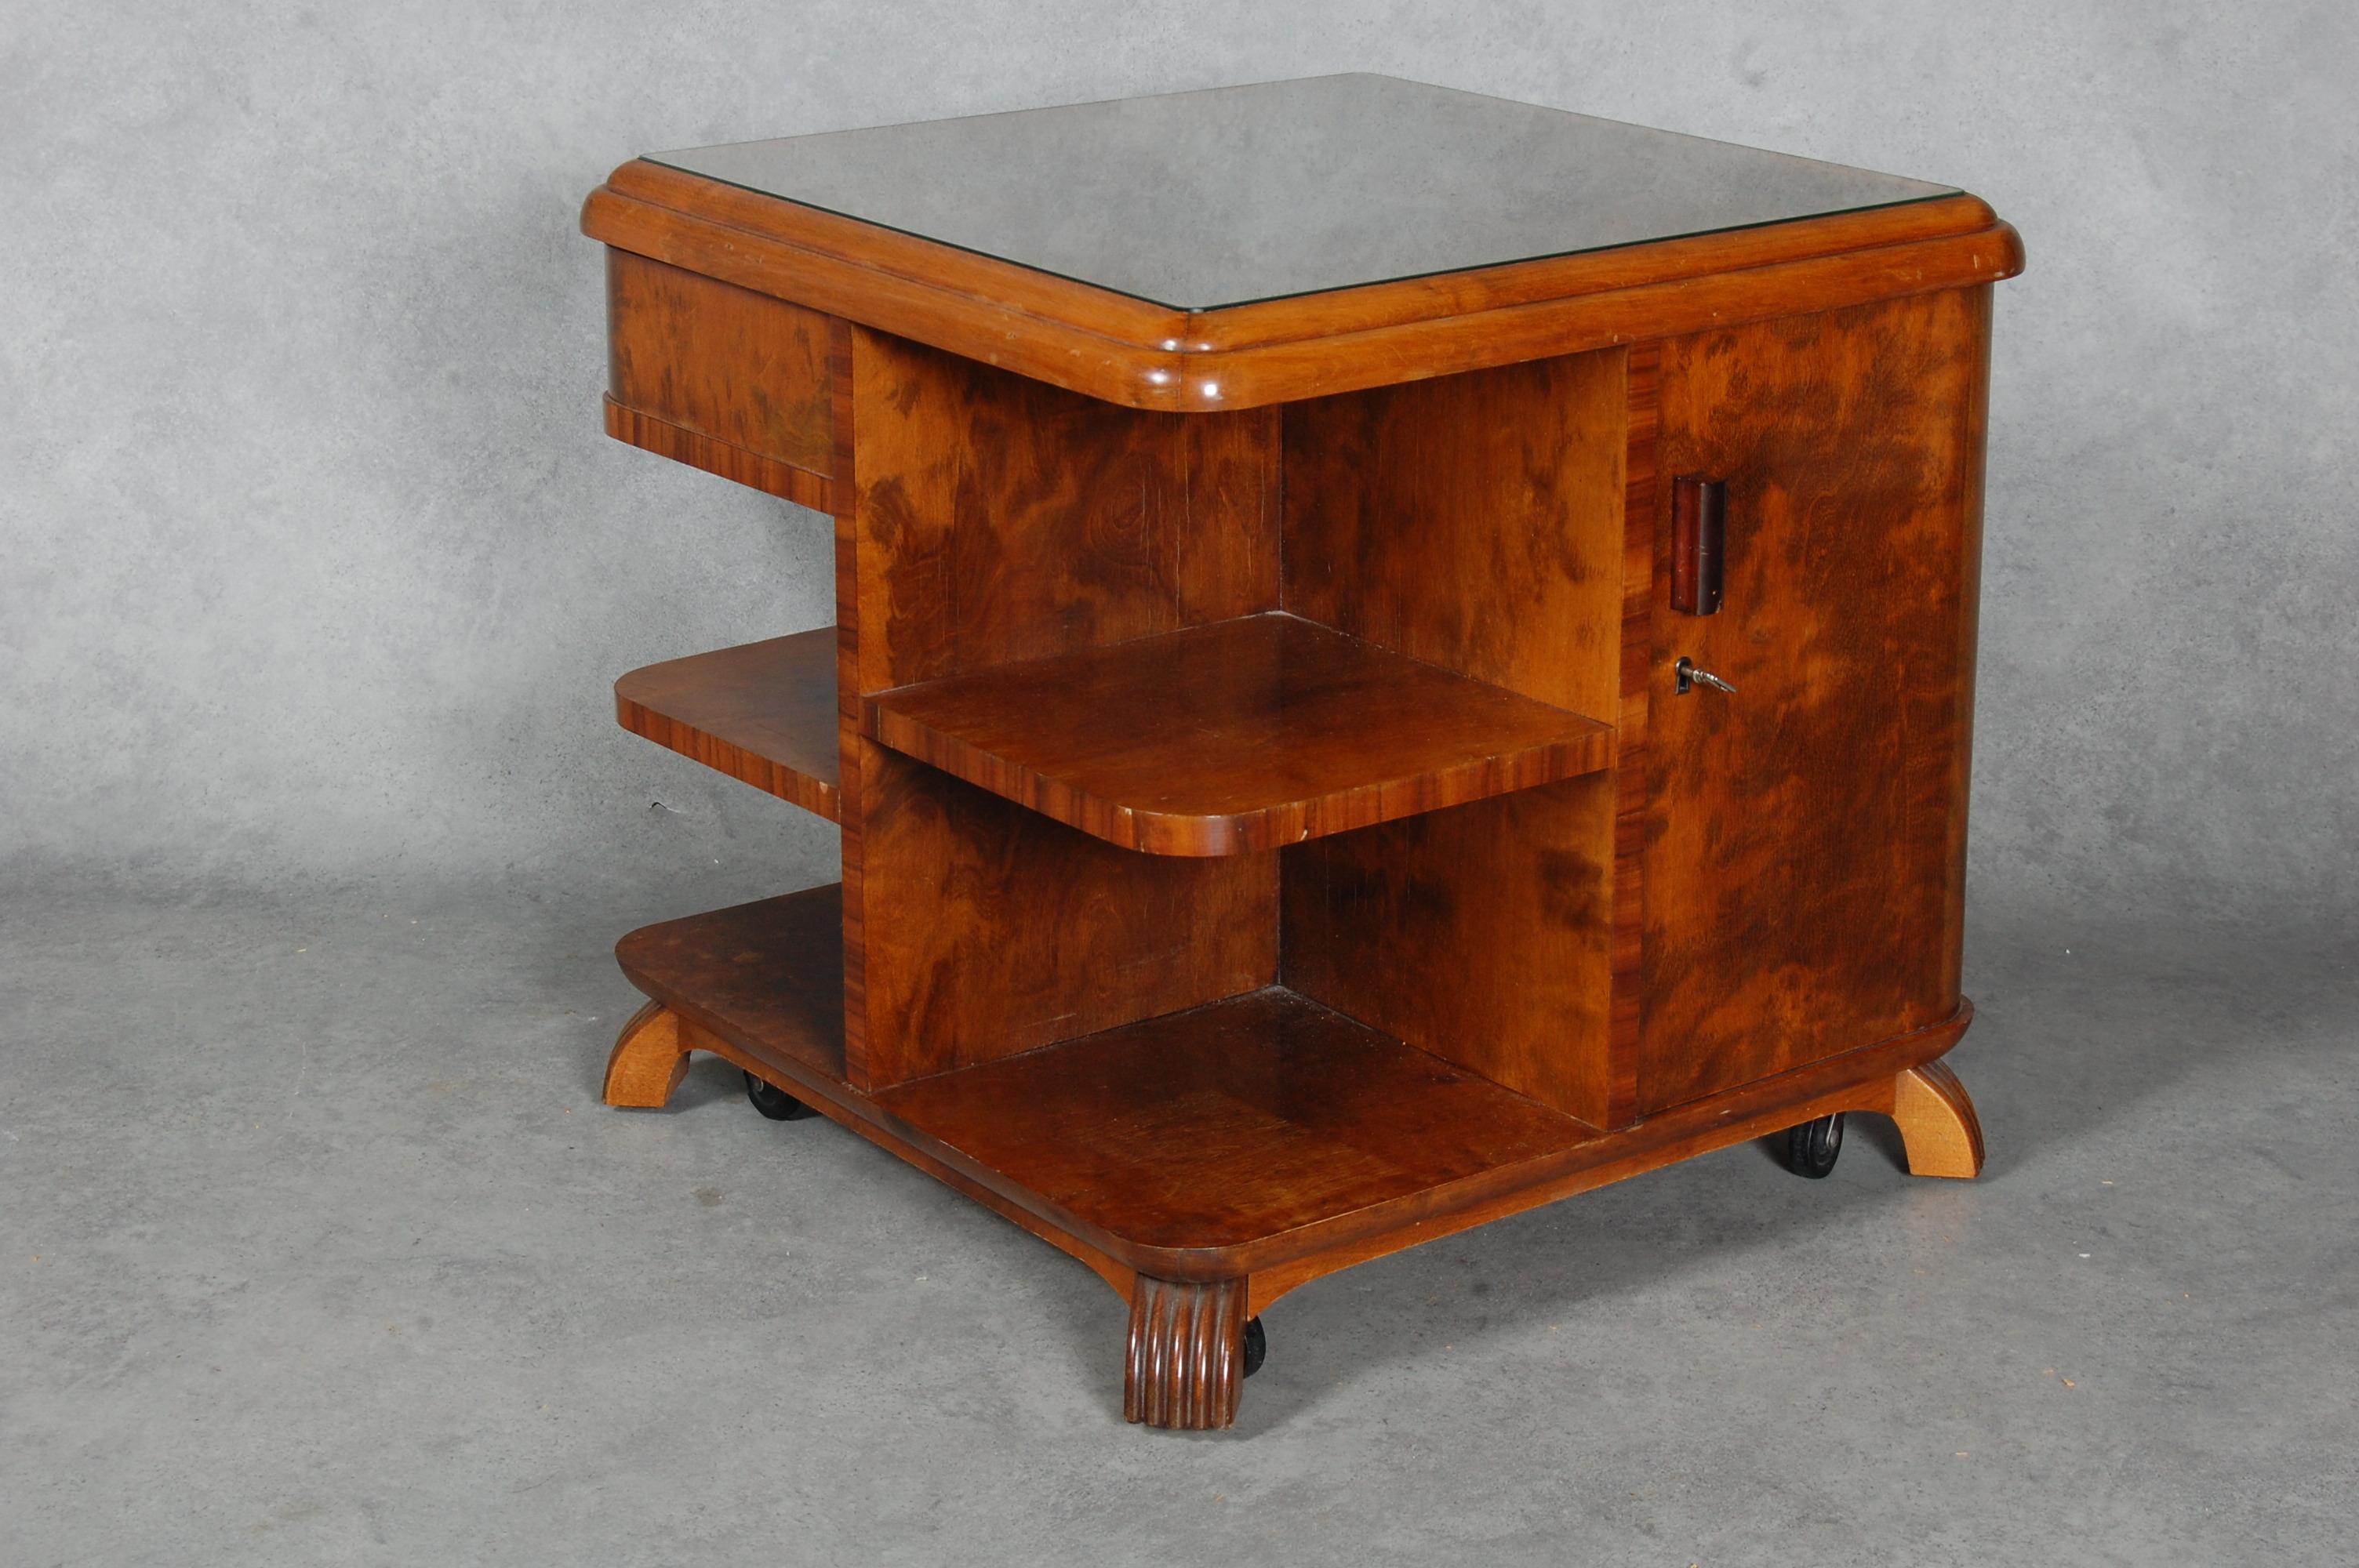 bilder f r 71130 soffbord art deco 1900 talets f rsta h lft auctionet. Black Bedroom Furniture Sets. Home Design Ideas